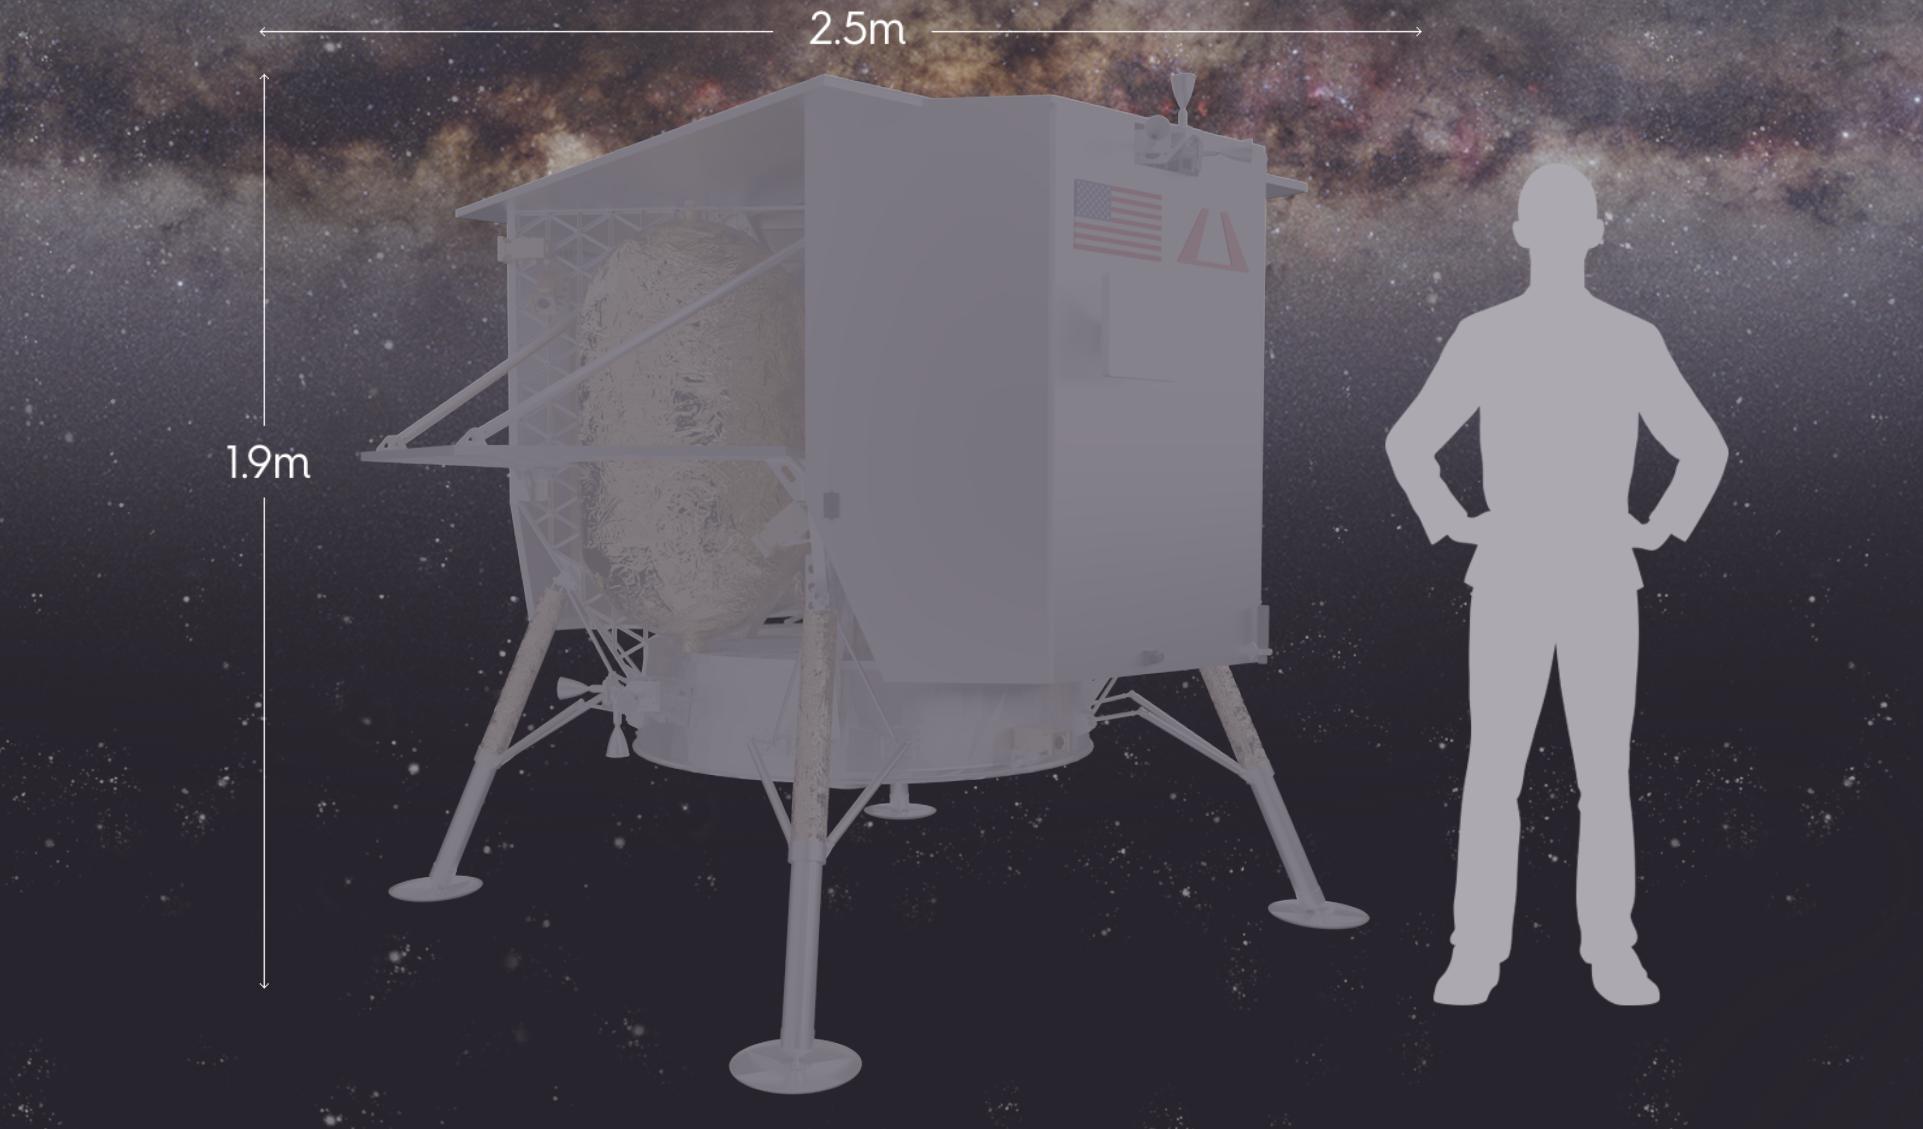 Peregrine lander scale (Astrobotic) 1